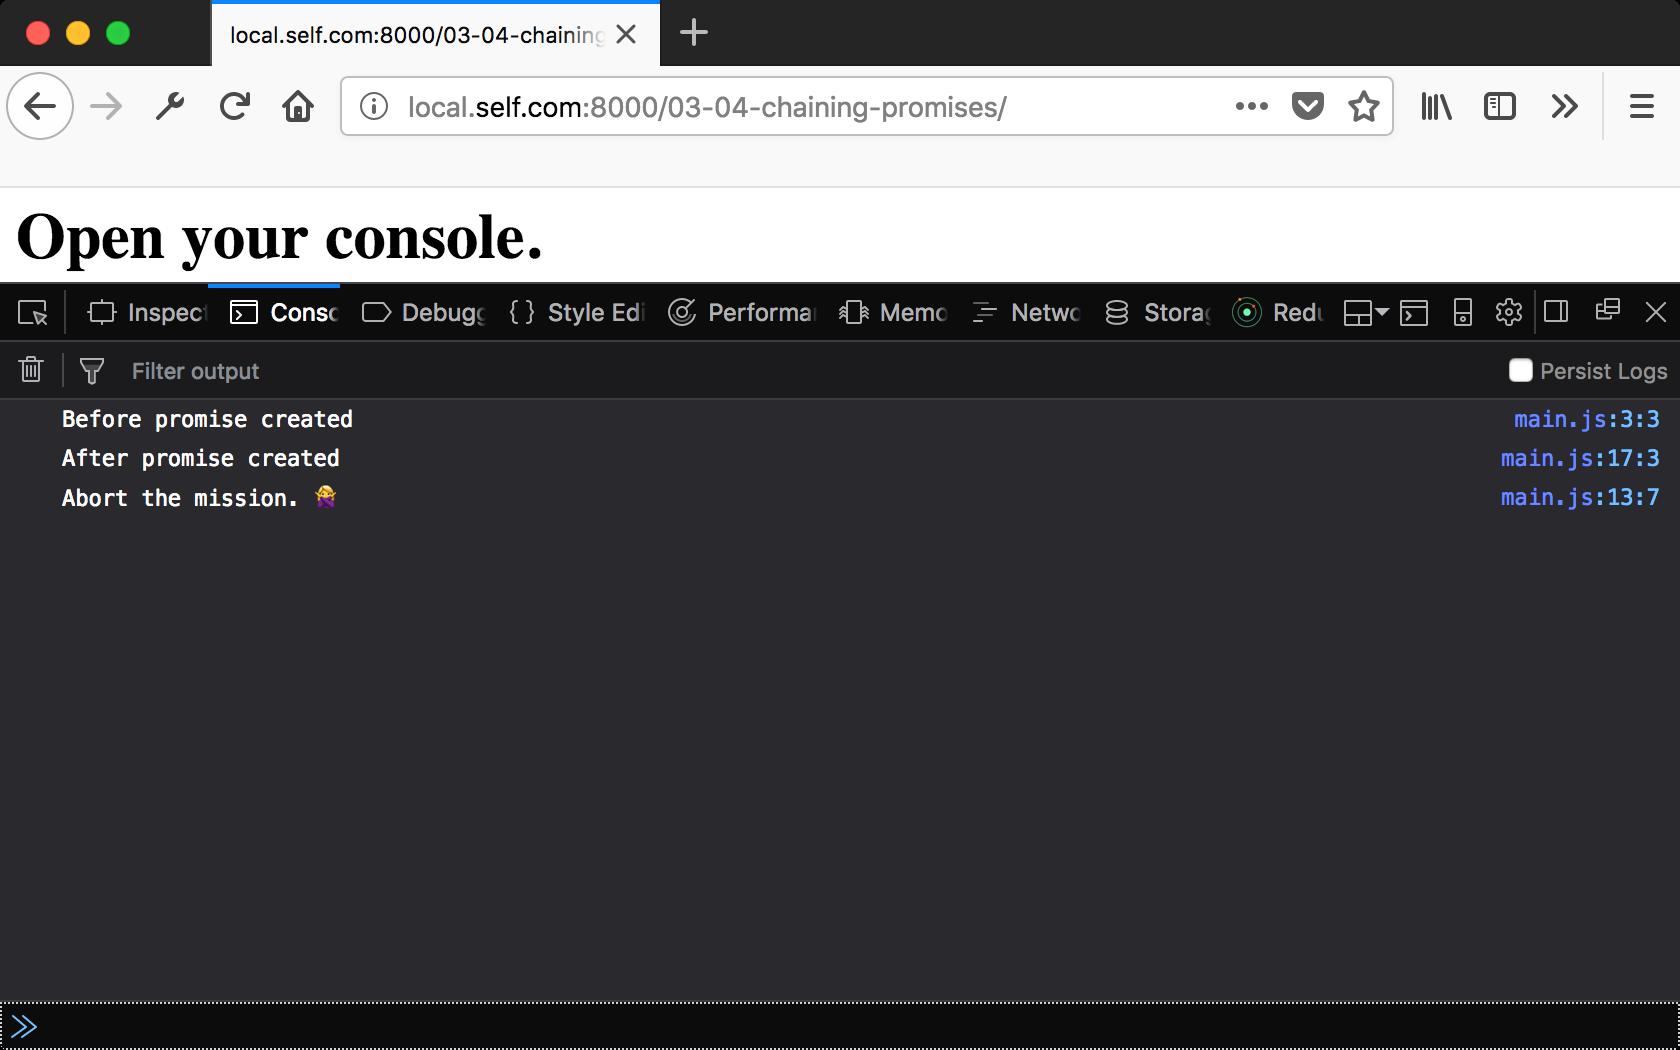 Open console